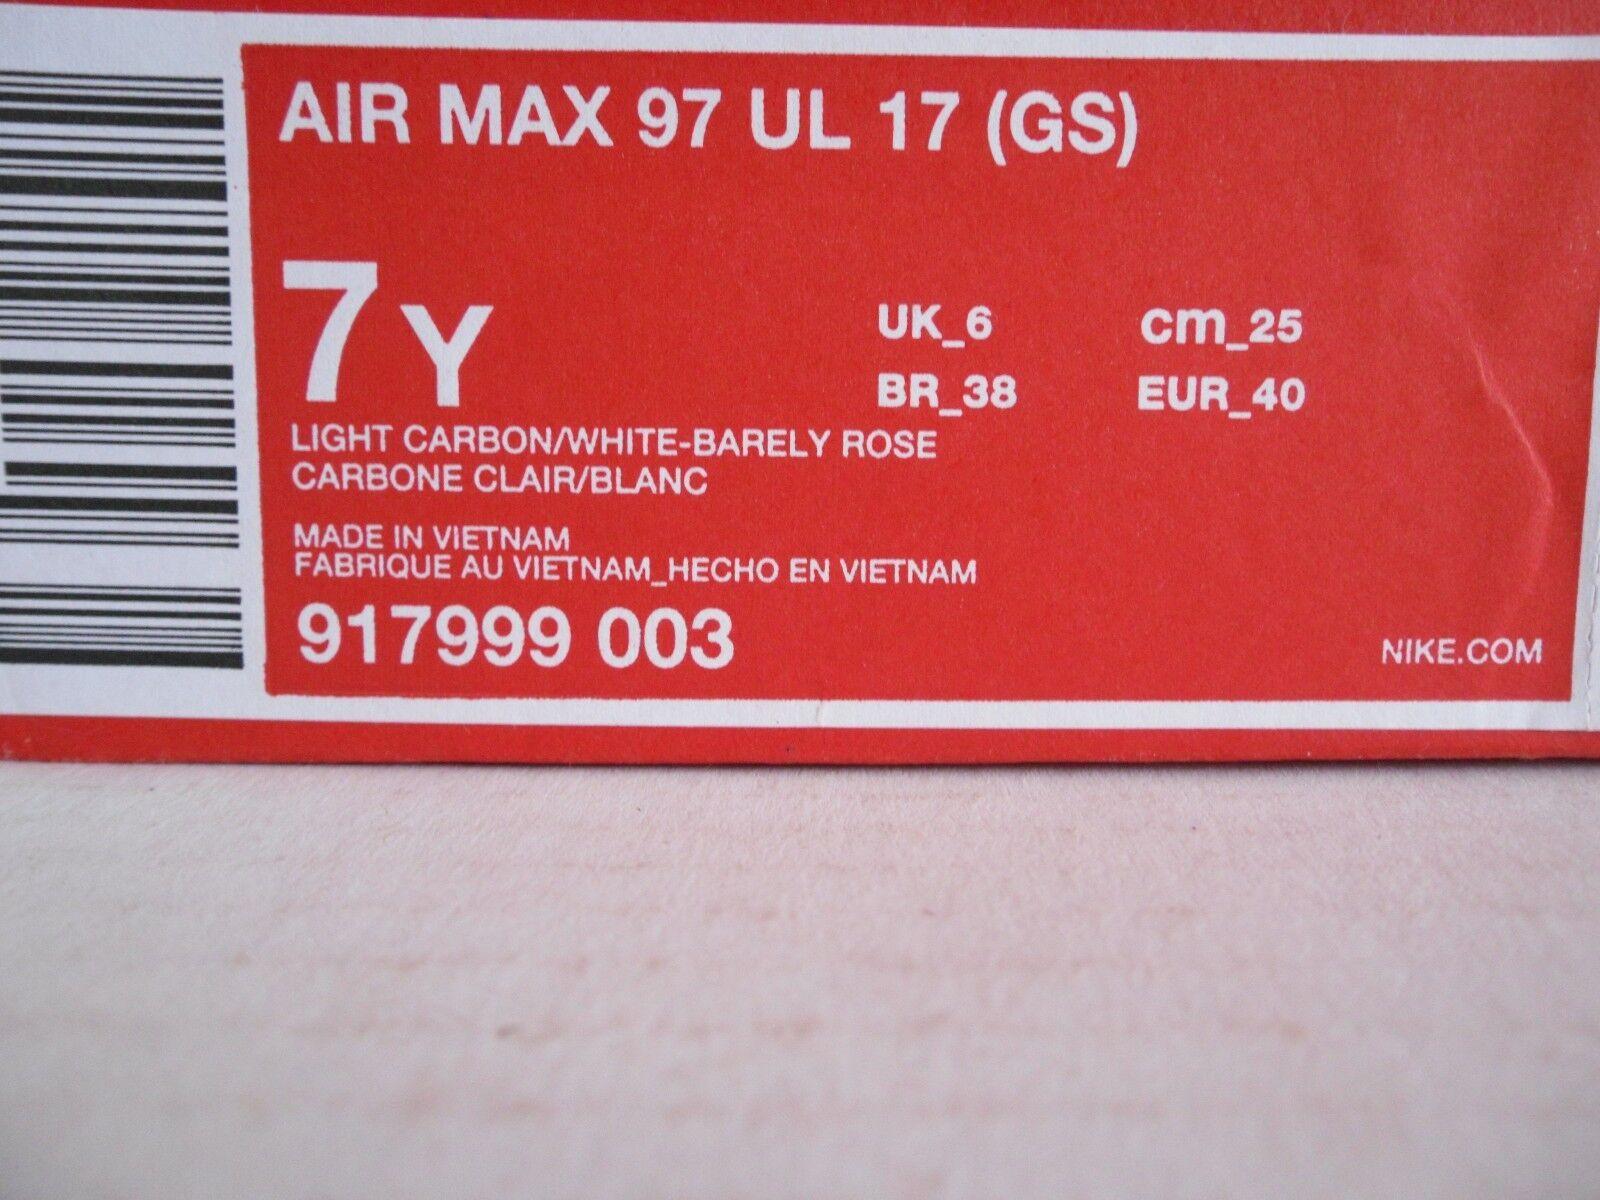 NIKE AIR MAX MAX MAX 97 UL 17 (GS) CARBON NAVY-ROSE SZ 7Y-Donna SZ 8.5 [917999-003] f92bbf